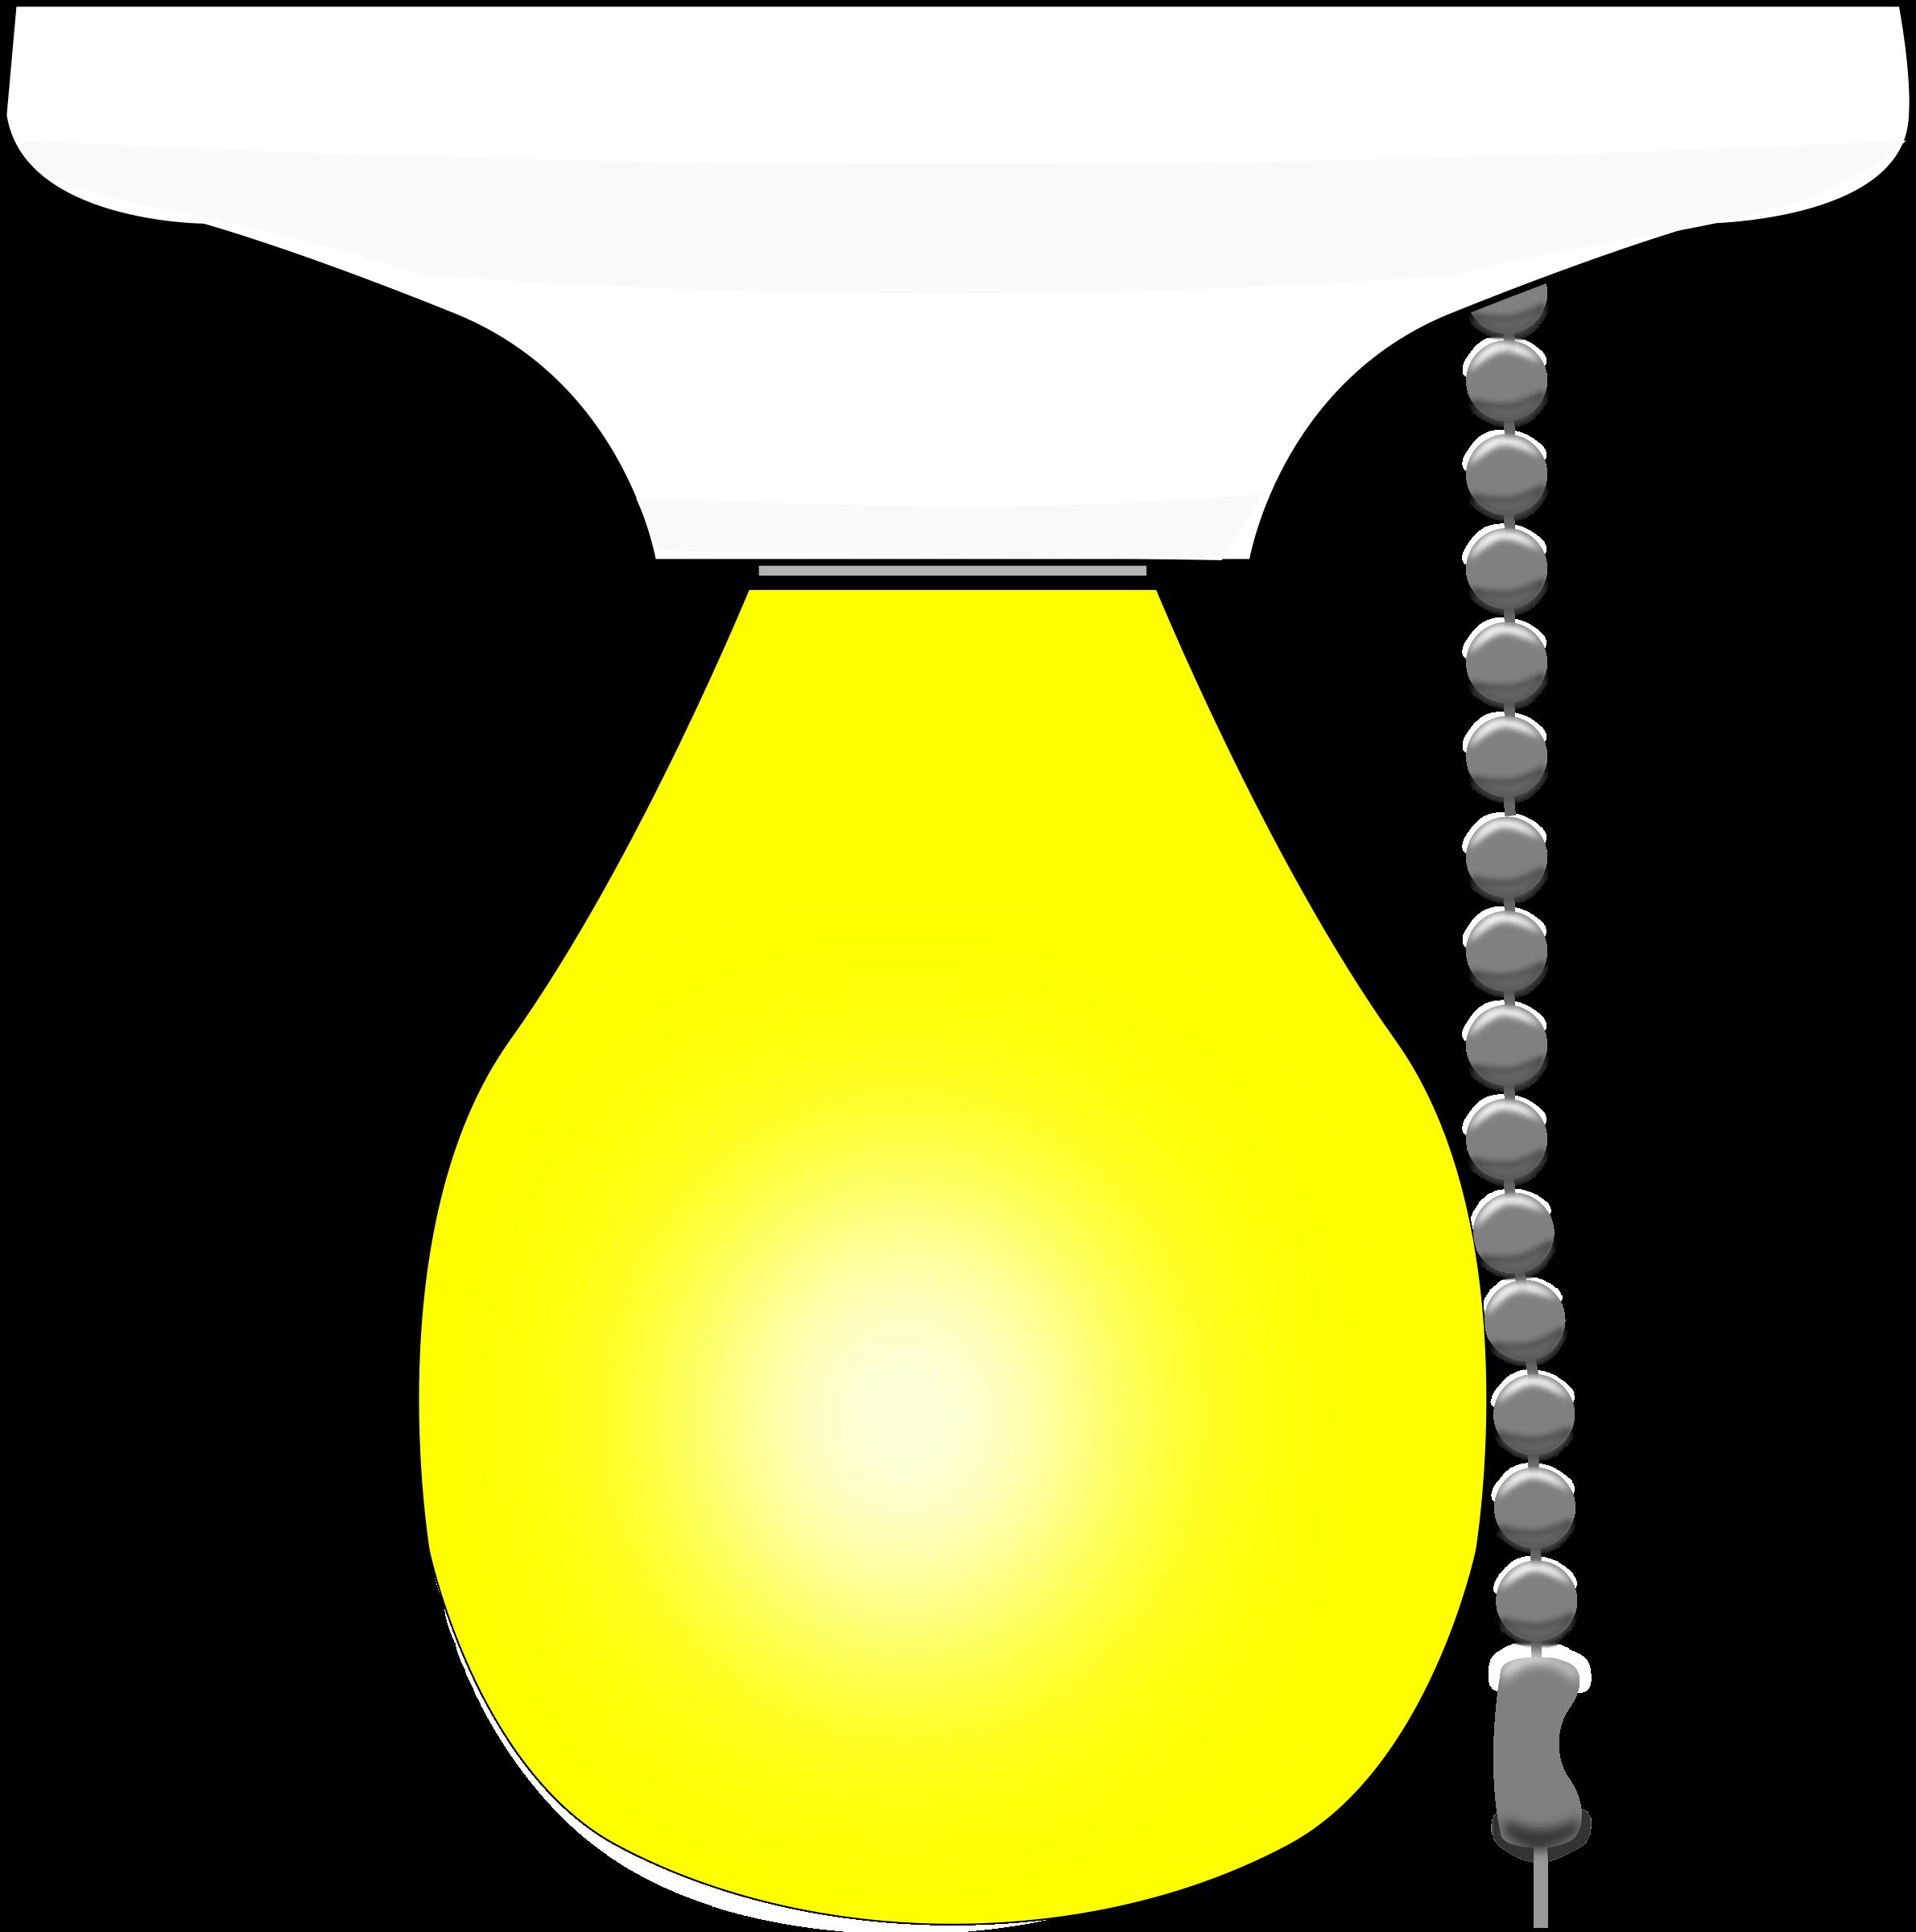 Lightbulb clipart light fixture. Bulb chain big image